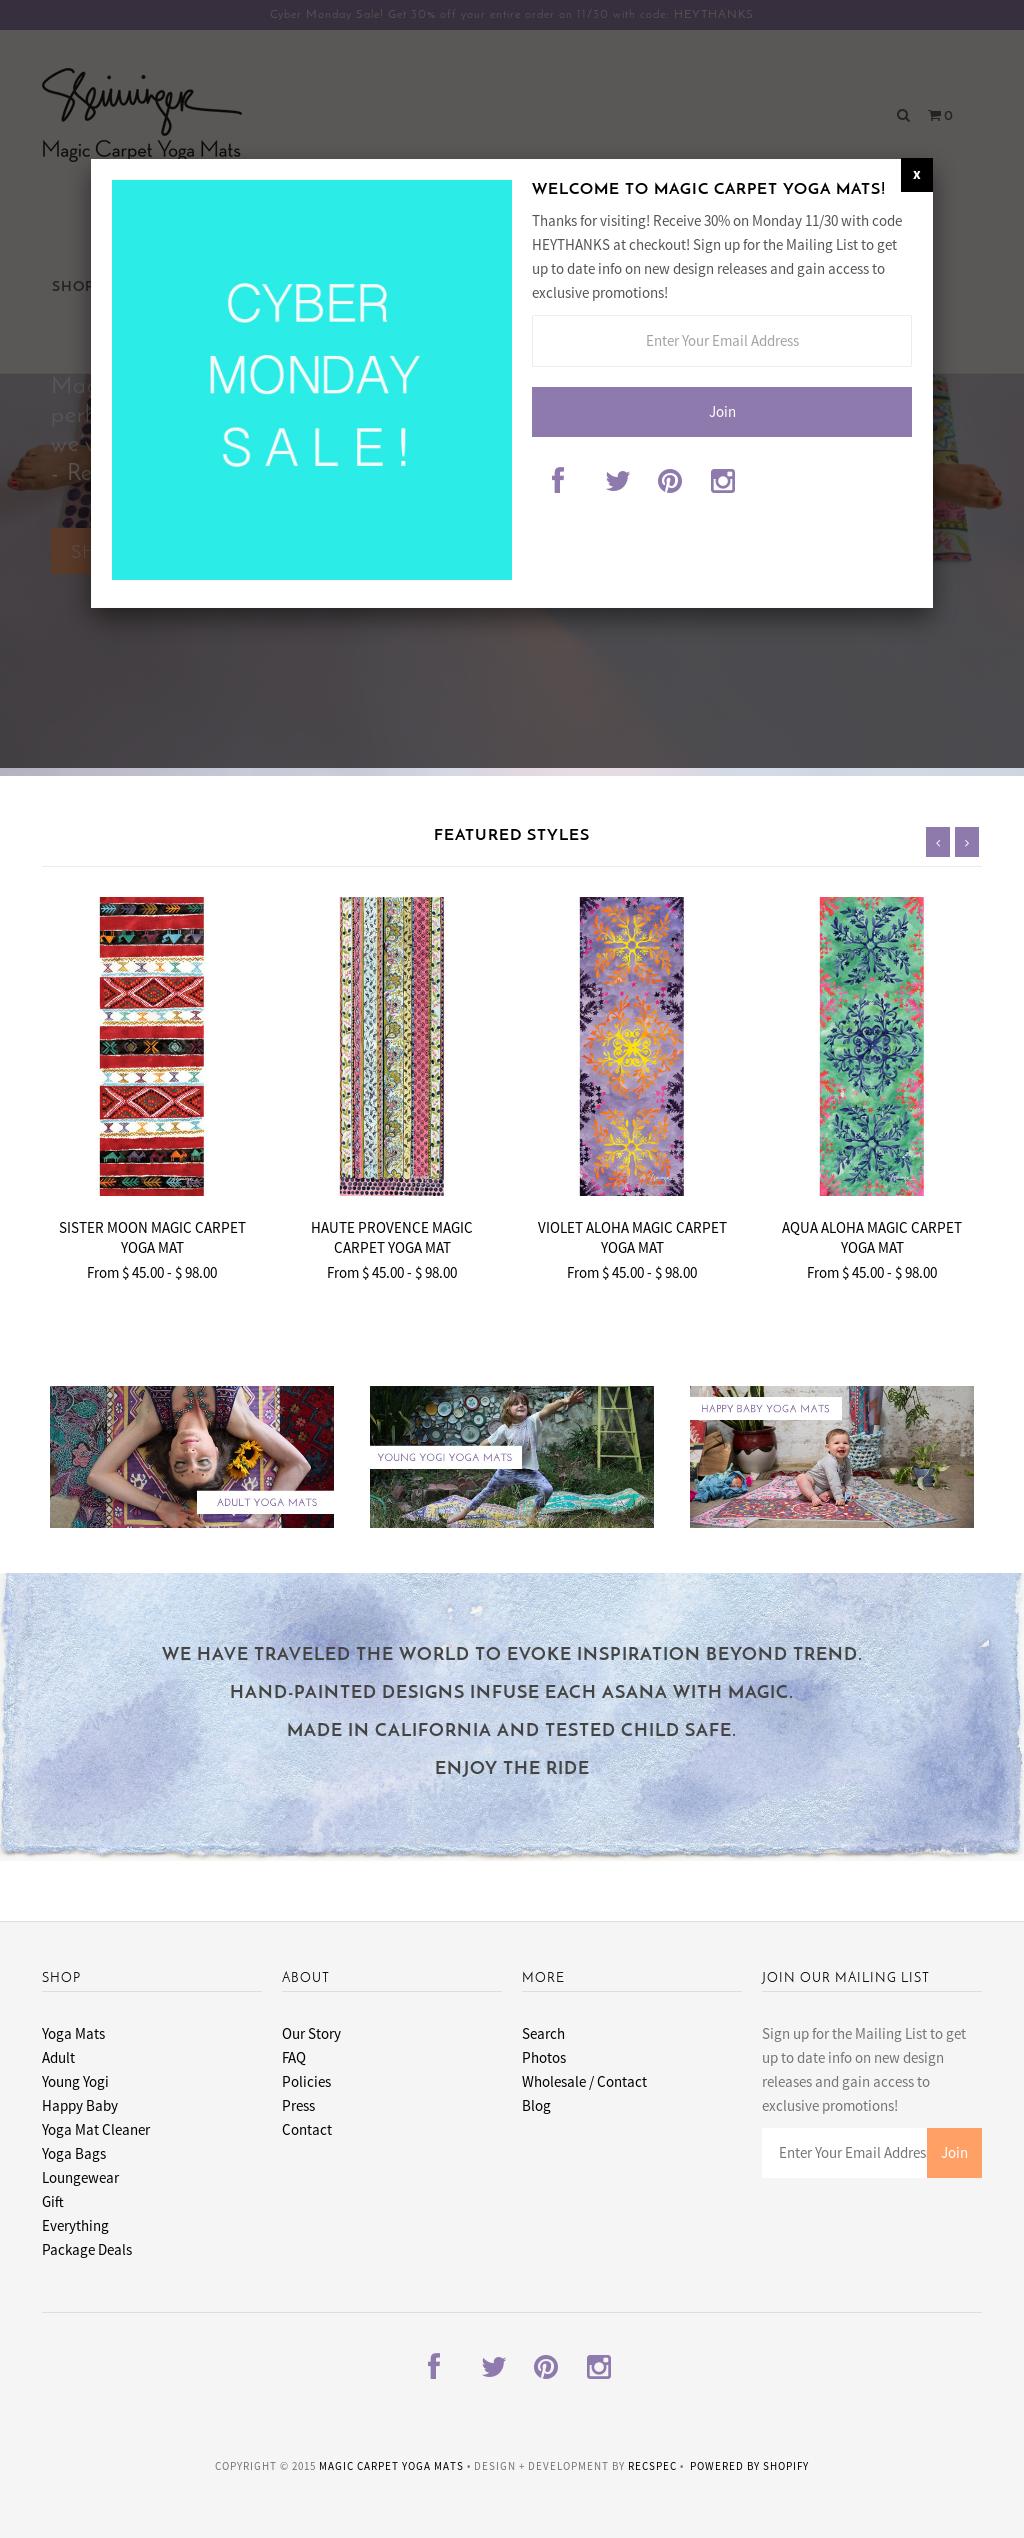 Magic Carpet Yoga Mats Competitors, Revenue and Employees - Owler Company Profile